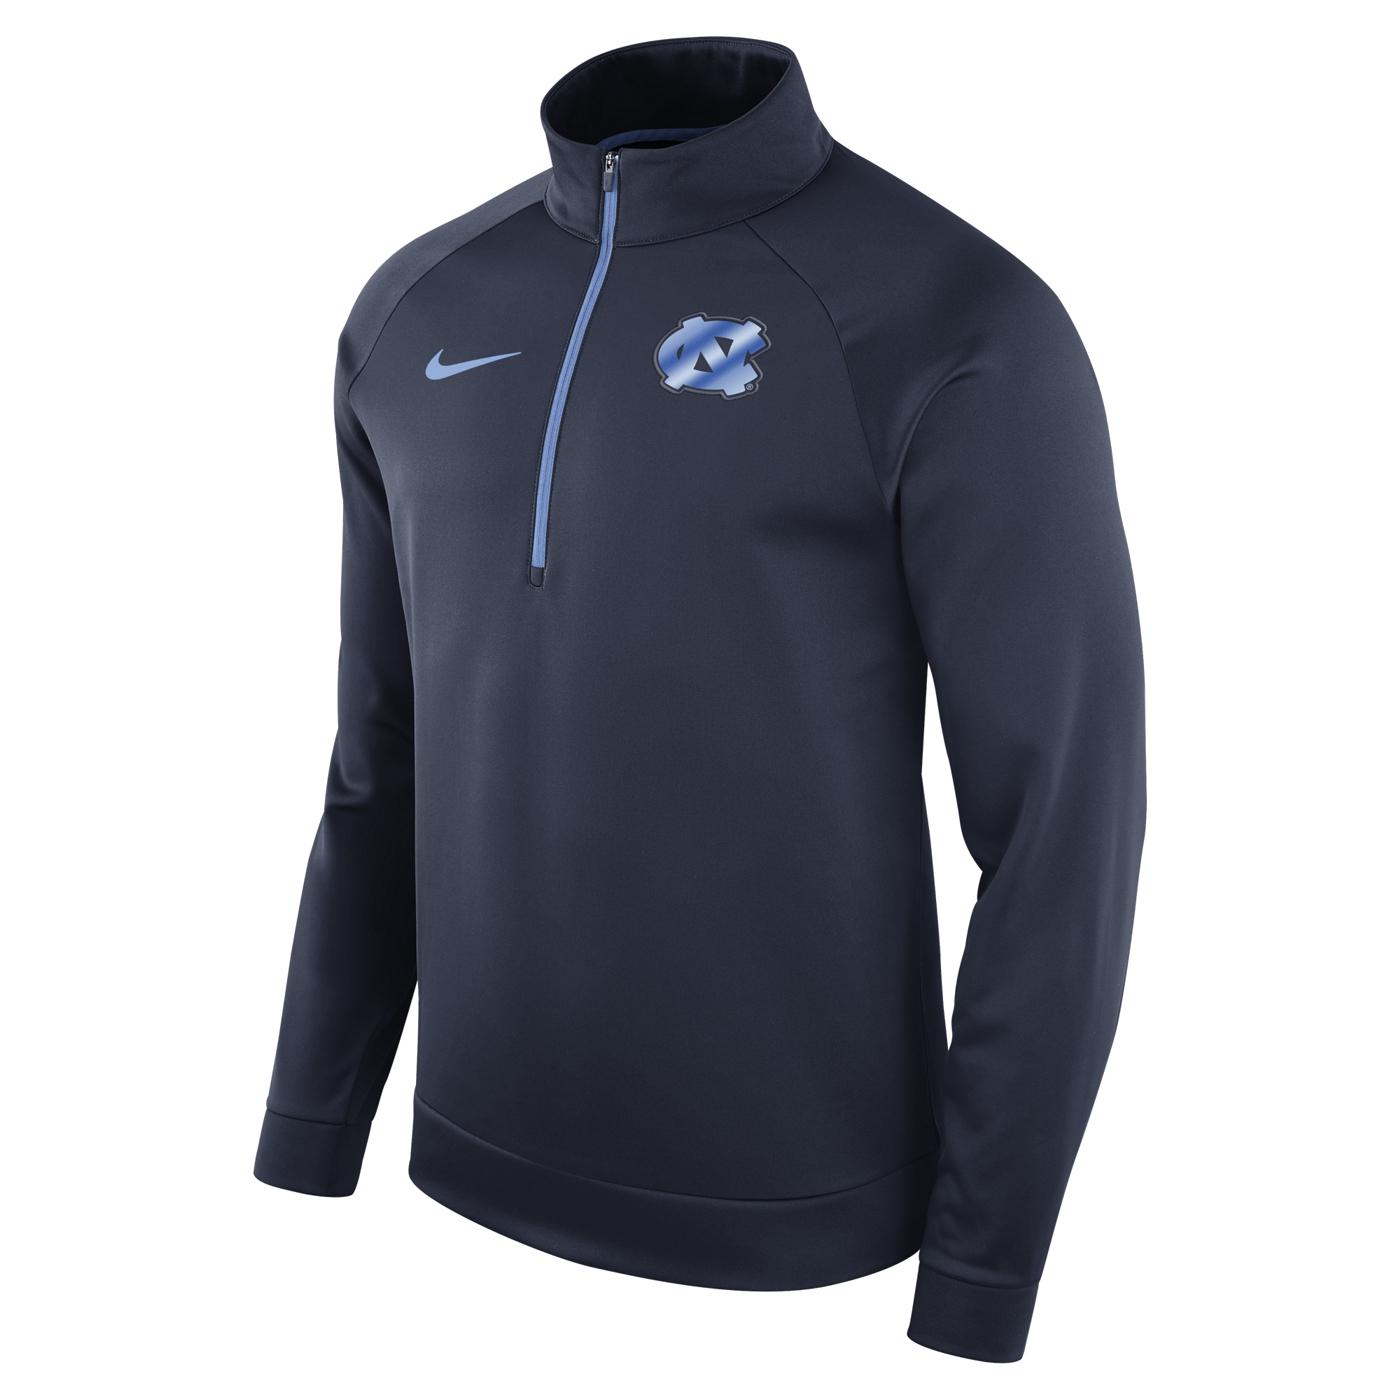 Johnny T-shirt - North Carolina Tar Heels - Nike Bench Light 1/2 ...